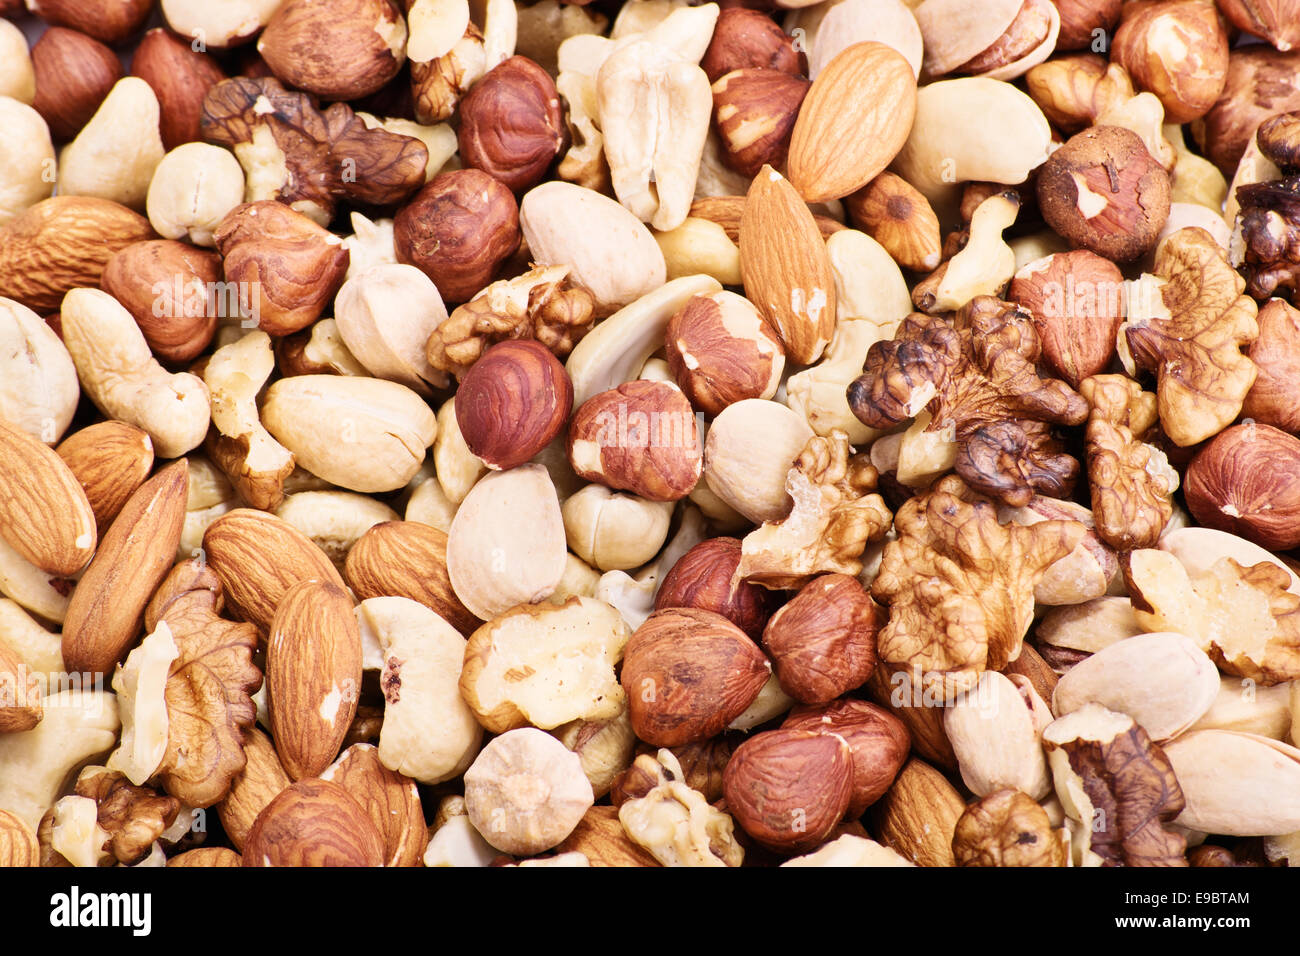 Mixture of almonds, hazelnuts, walnuts, cashews and pistachios. - Stock Image